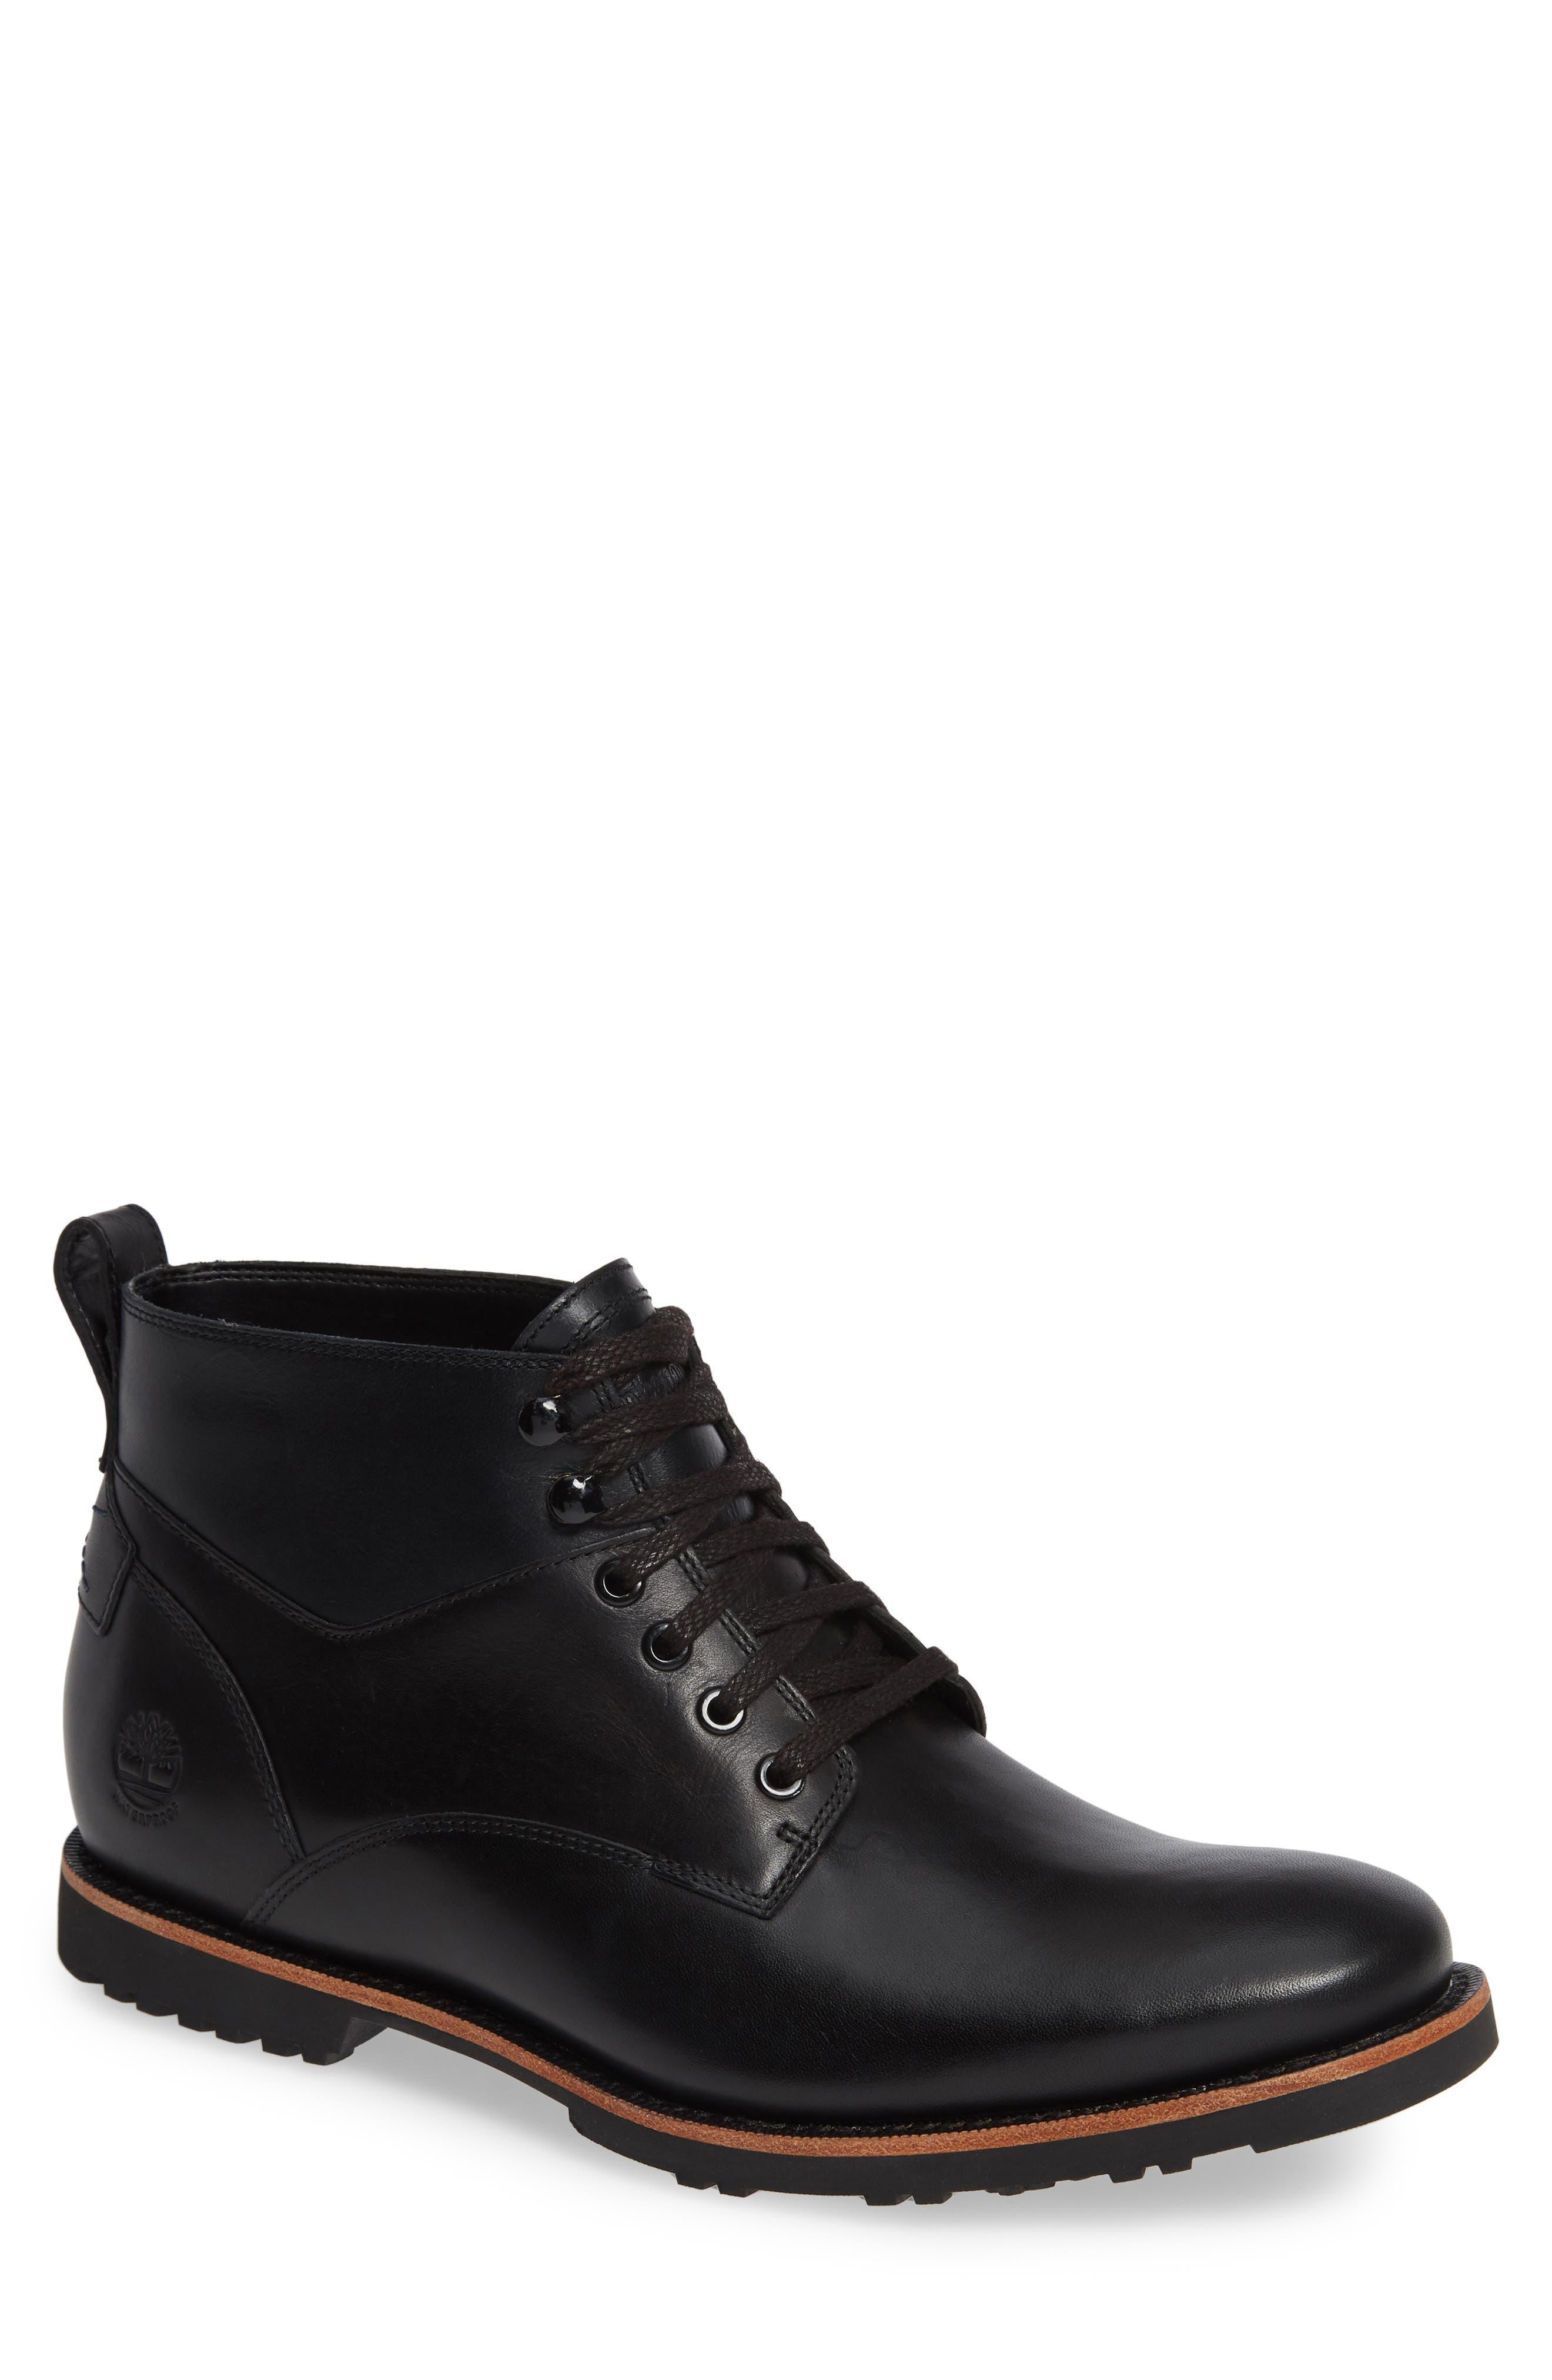 Timberland Kendrick Waterproof Chukka Boot, Black